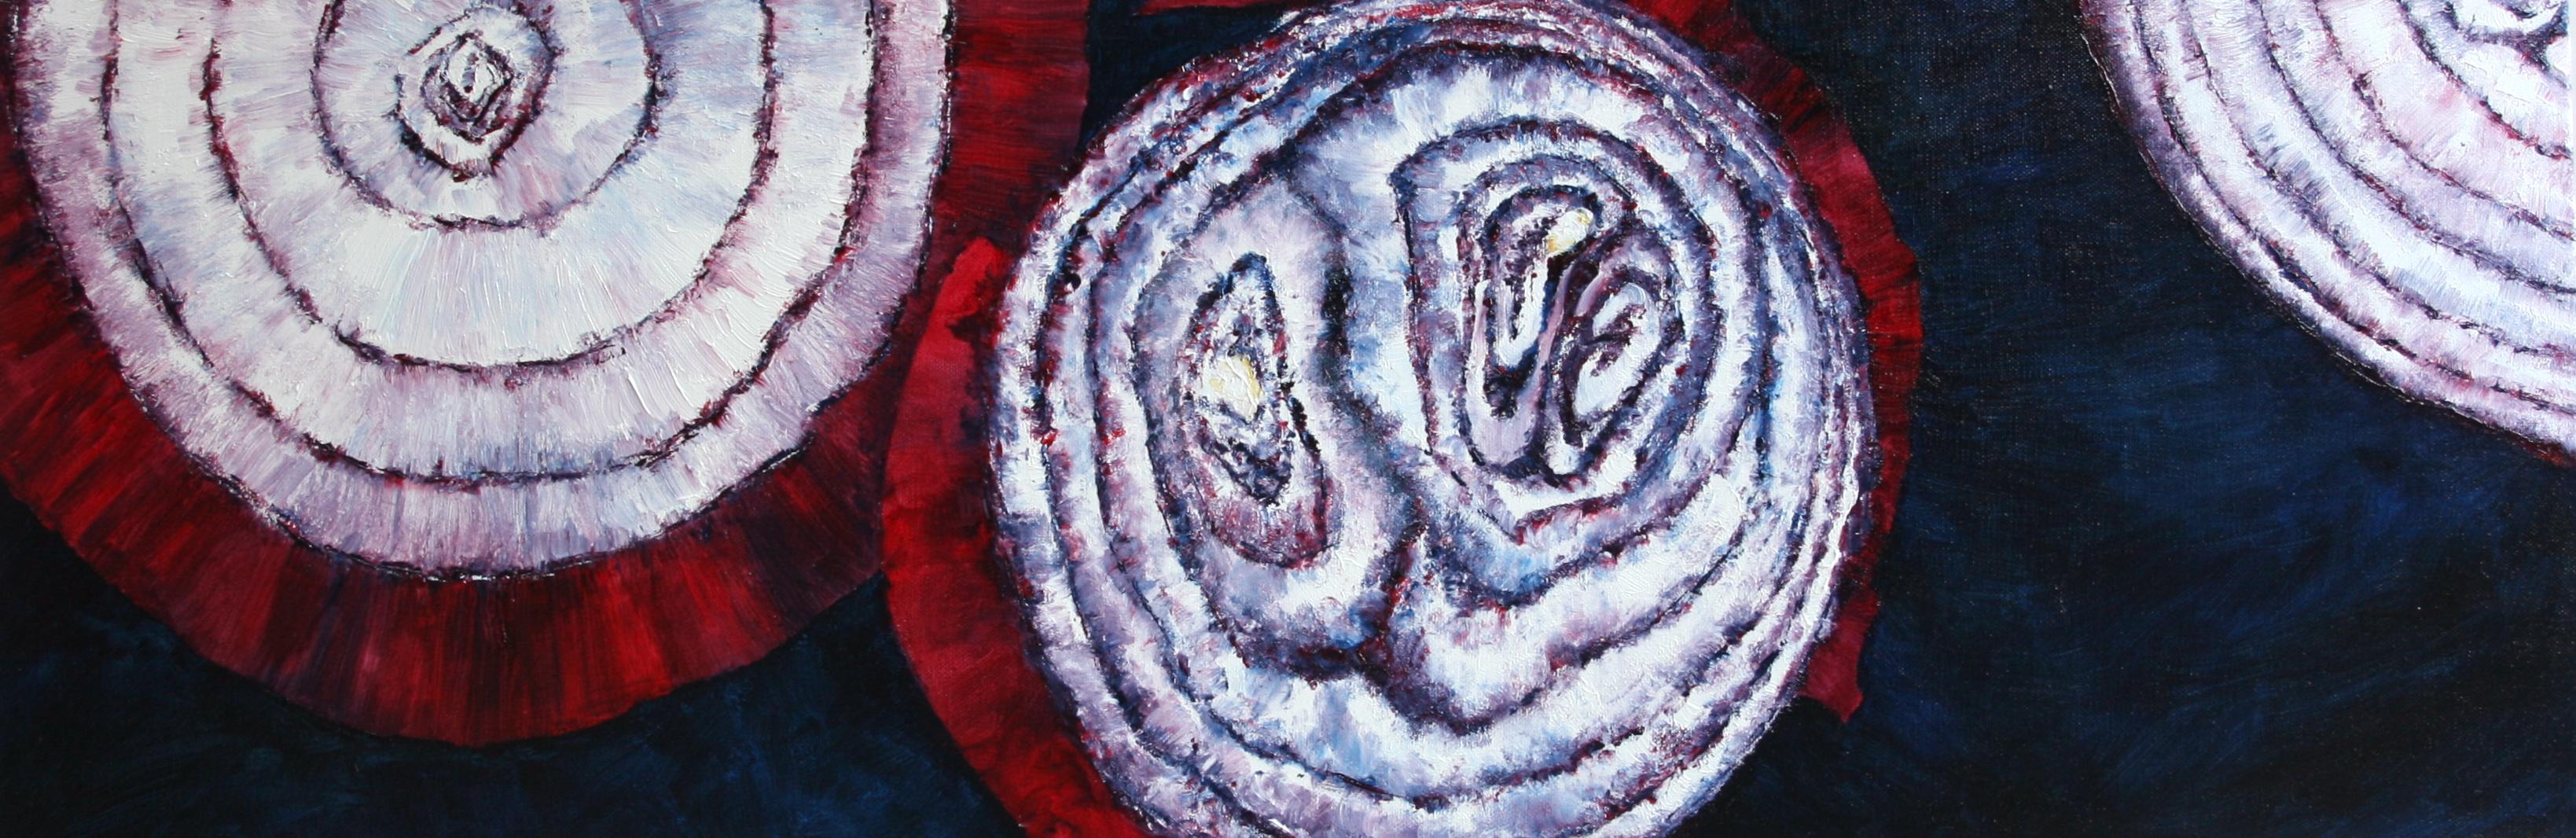 Three Red Onion Rings 2